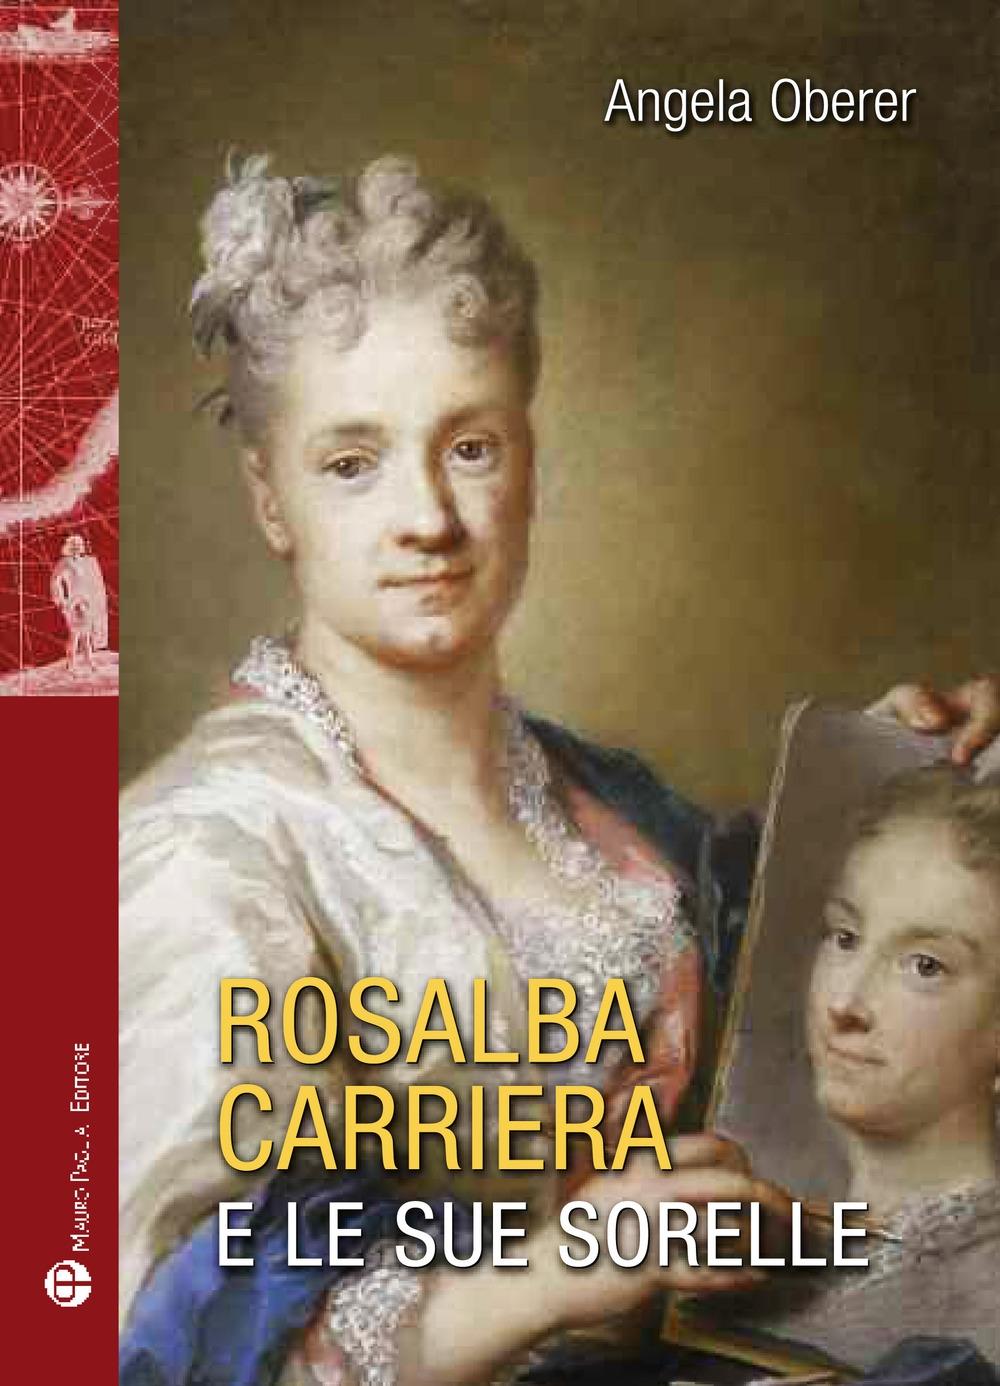 Rosalba Carriere e le sue sorelle.